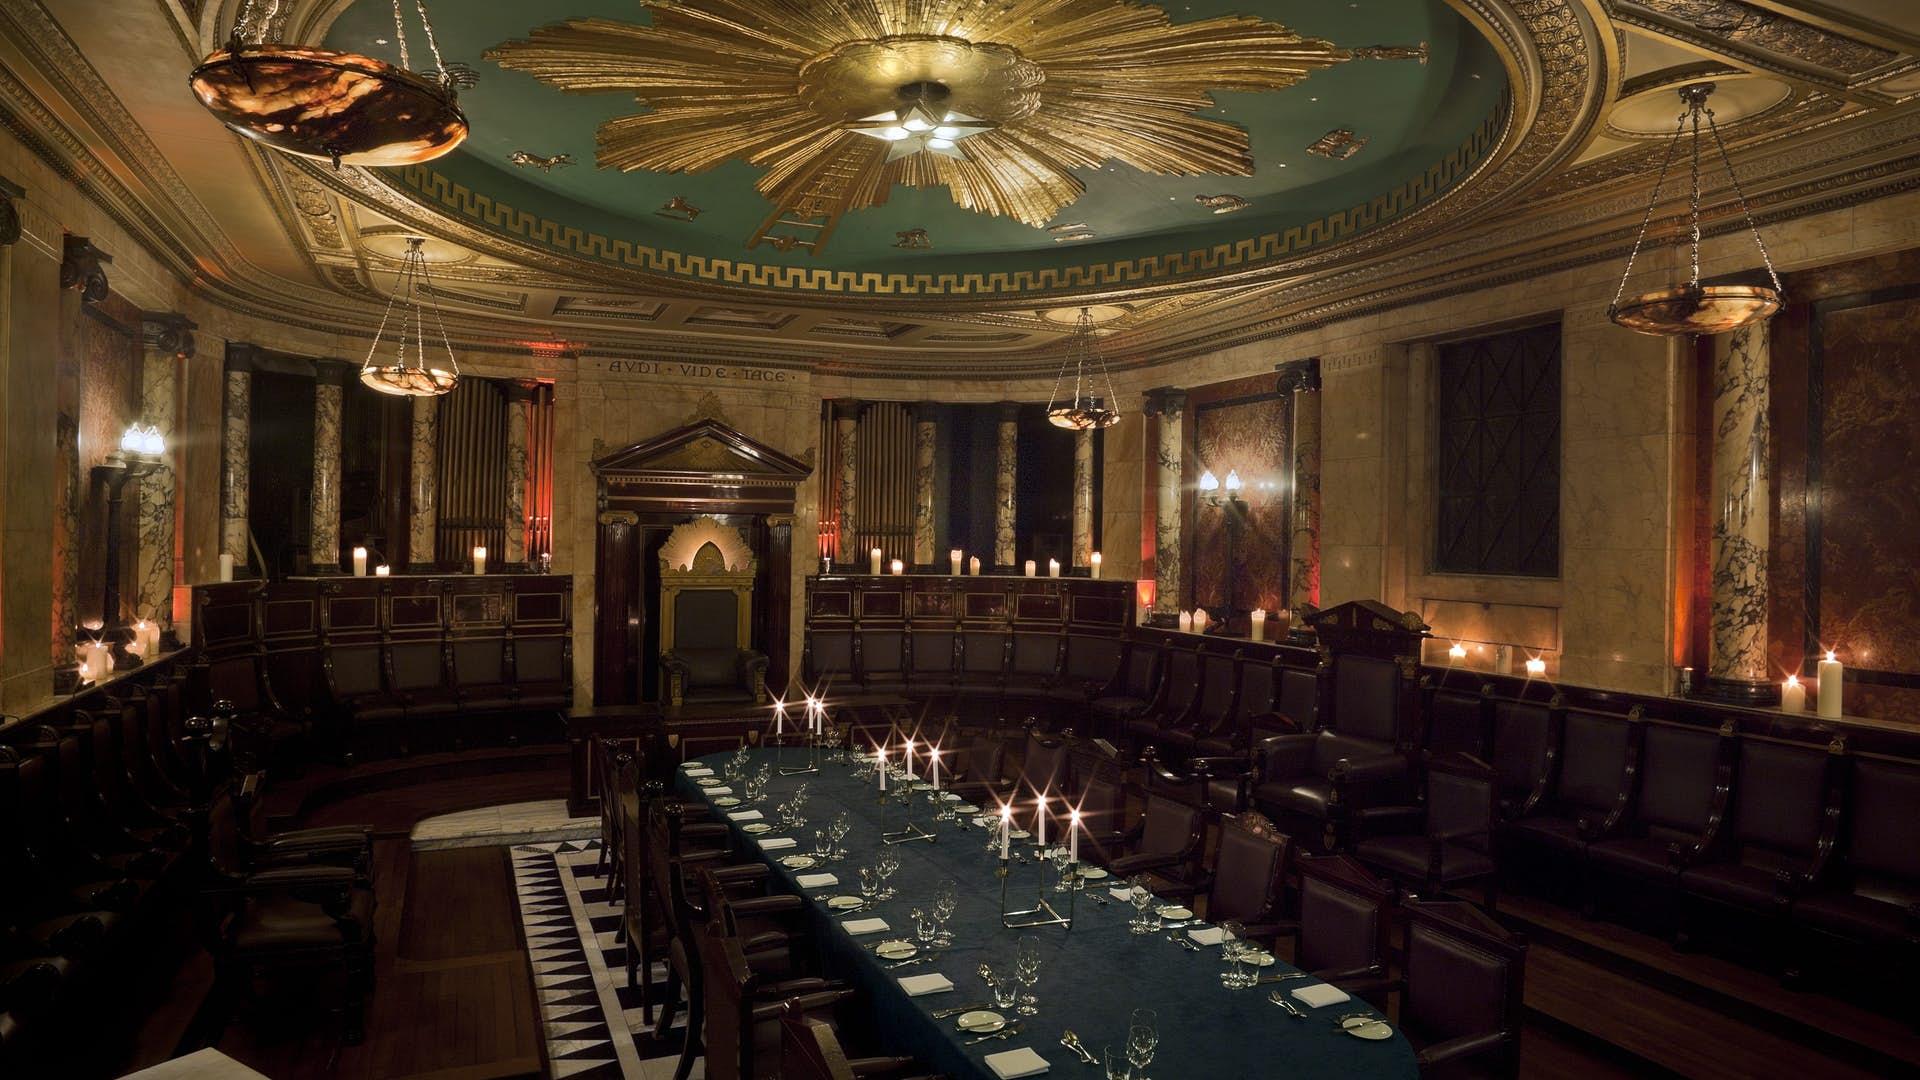 Dining set up at Masonic Temple